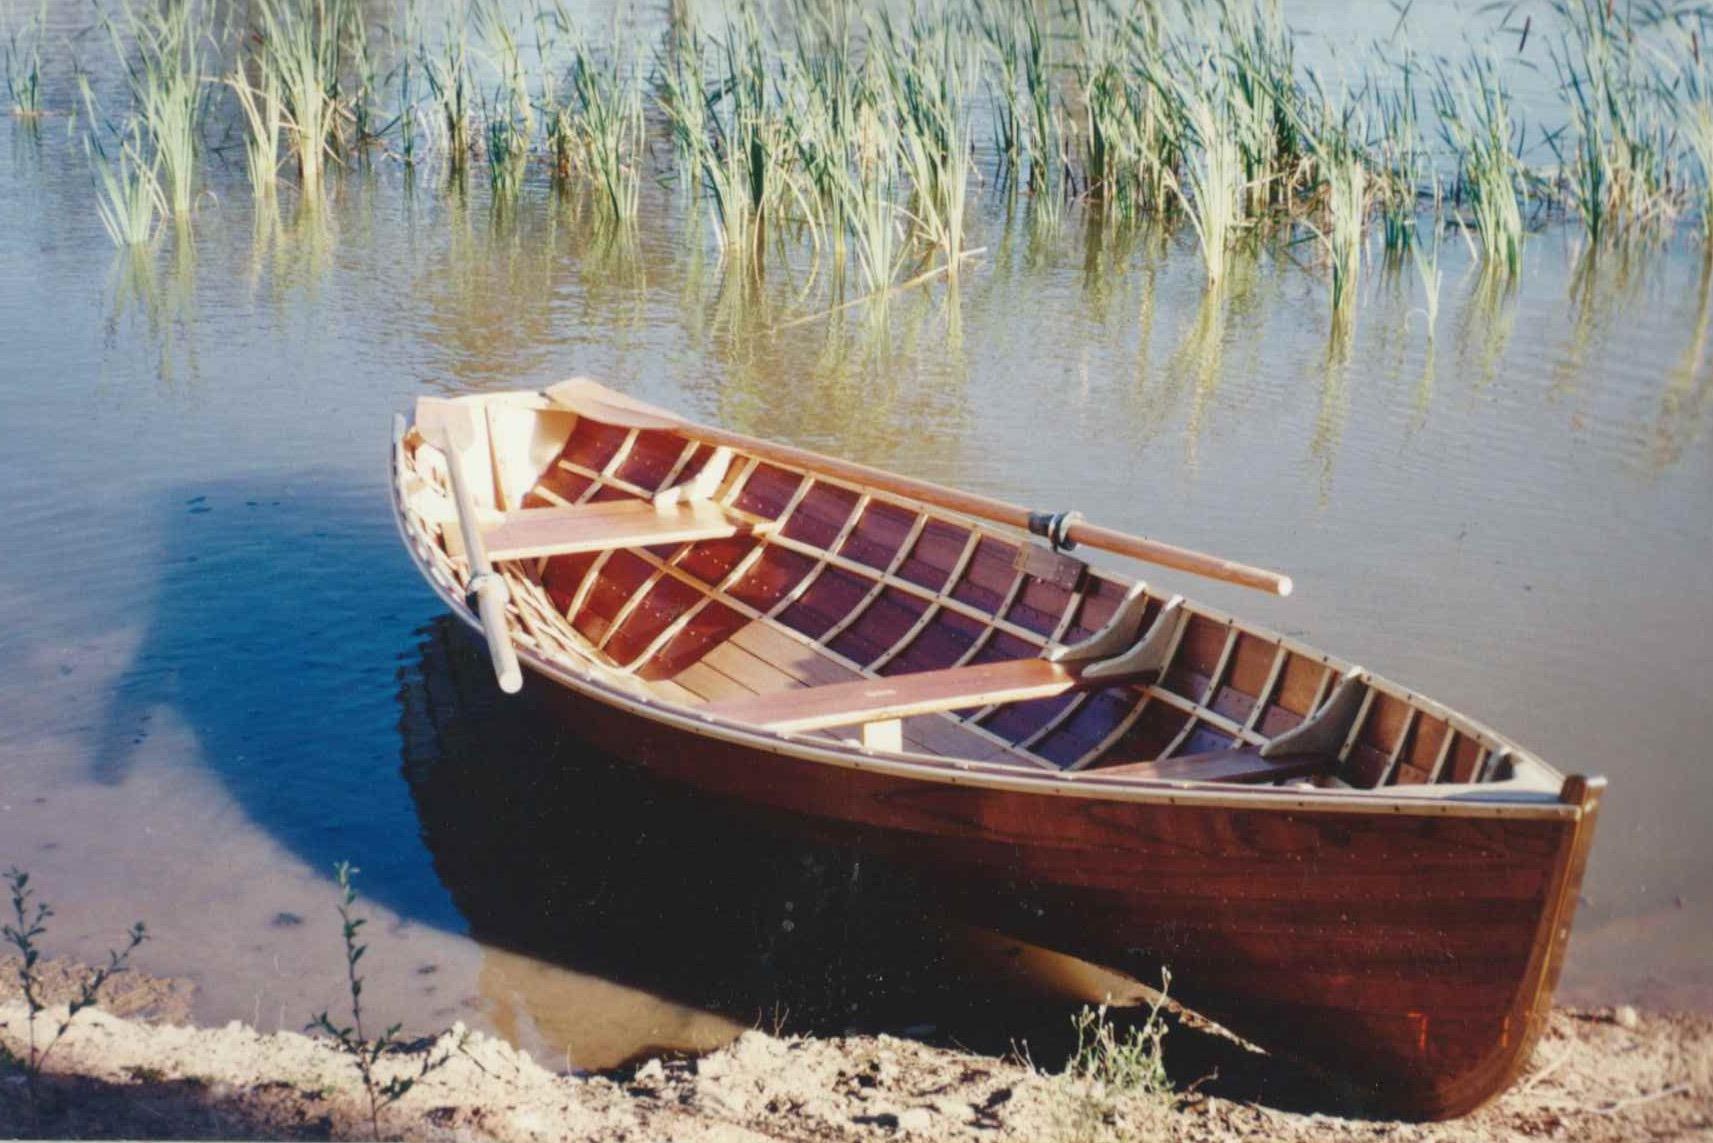 Gallery Archives - Sydney Wooden Boat School